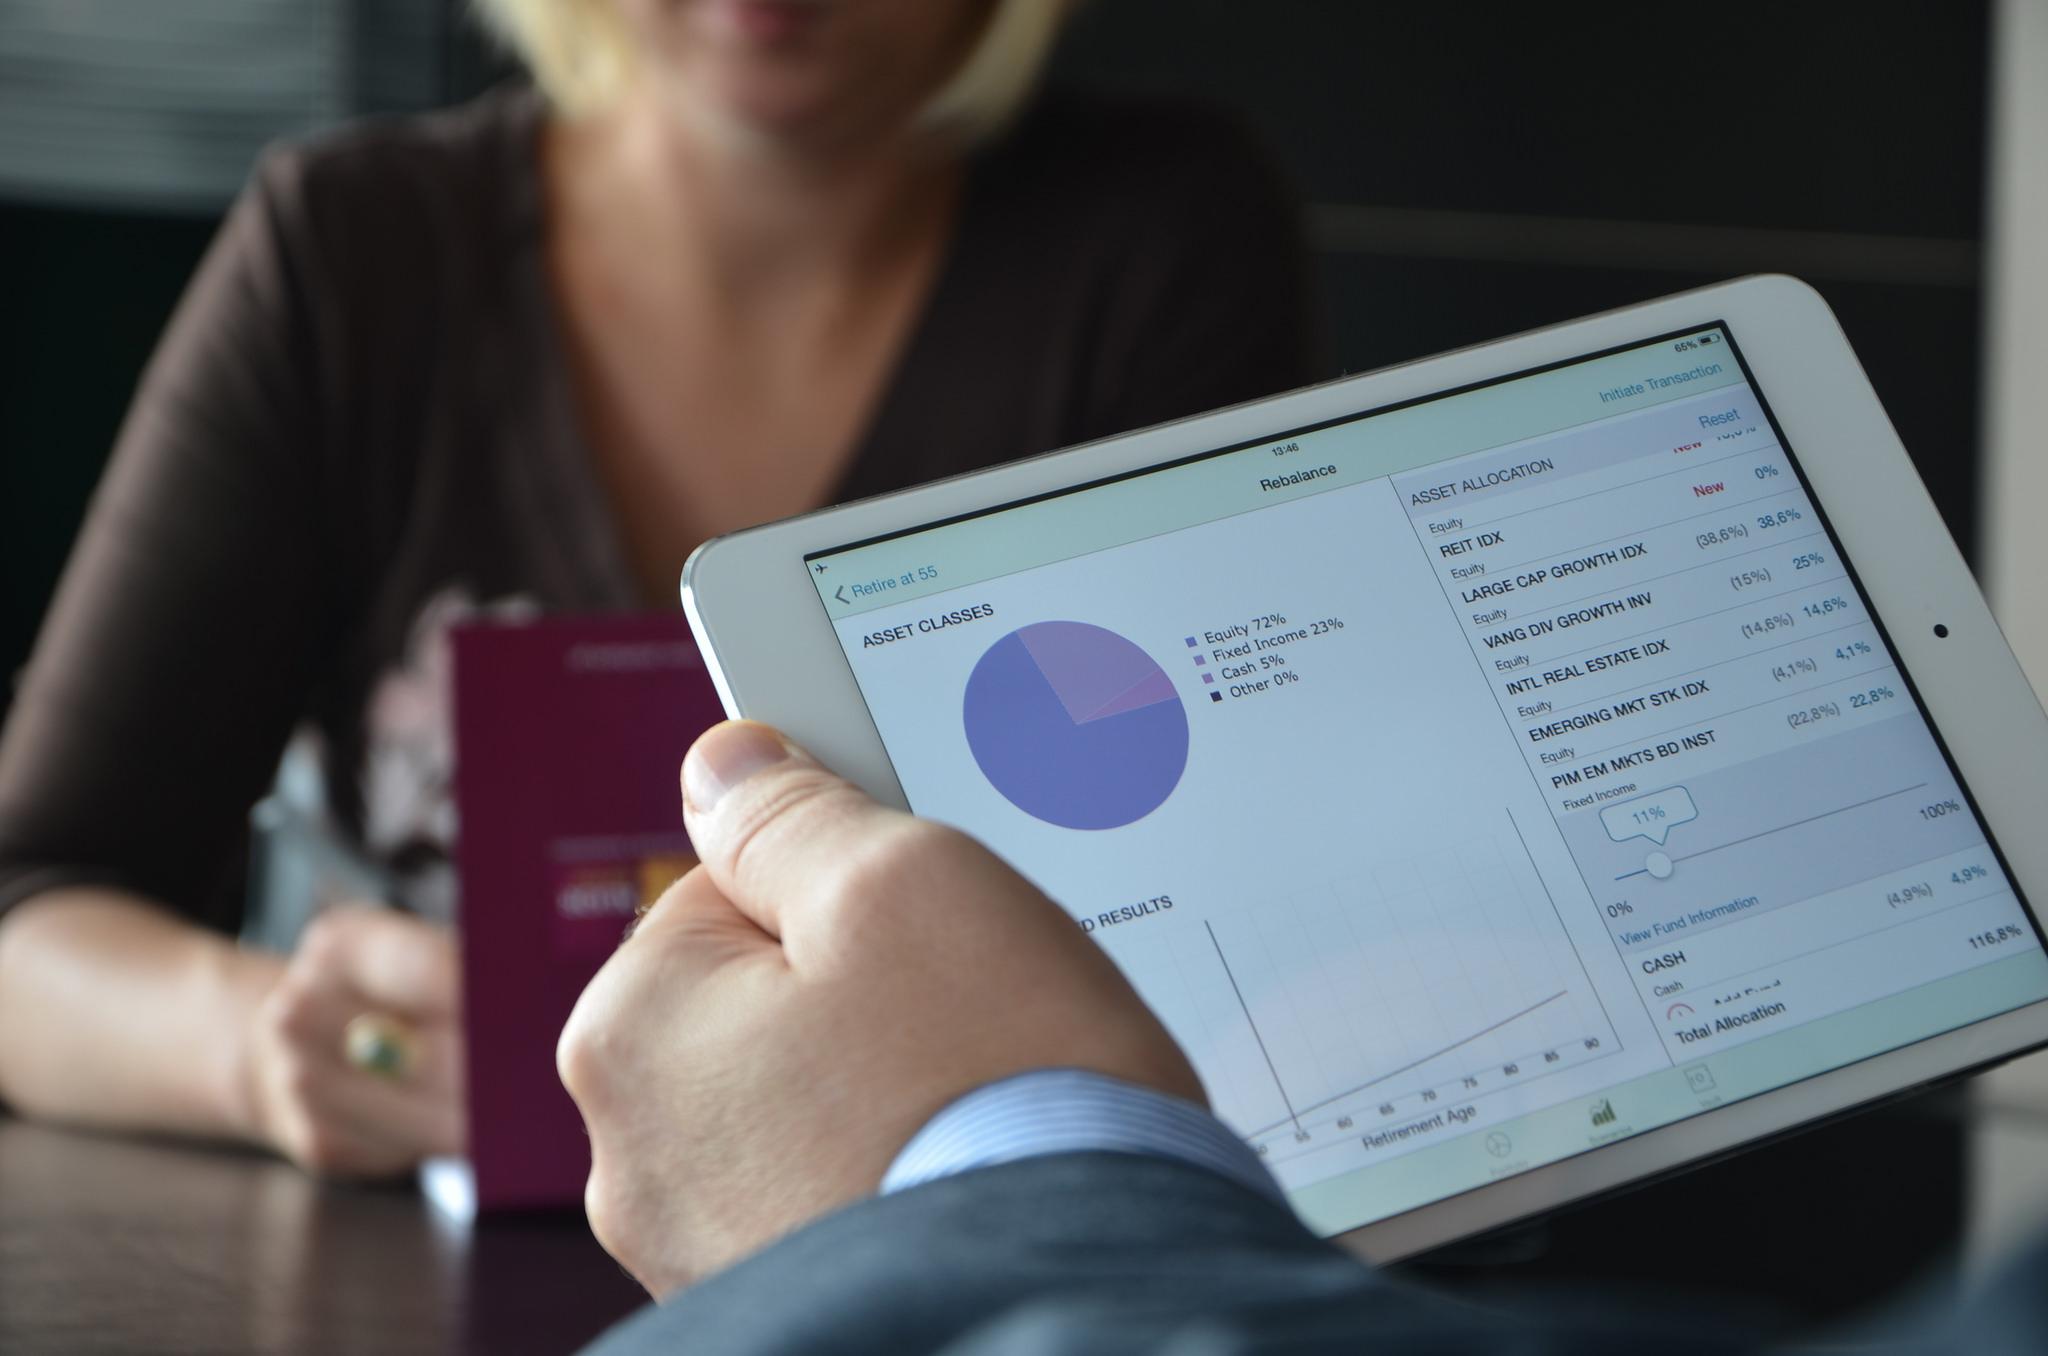 Googleマイビジネスのインサイトの見方と活用方法